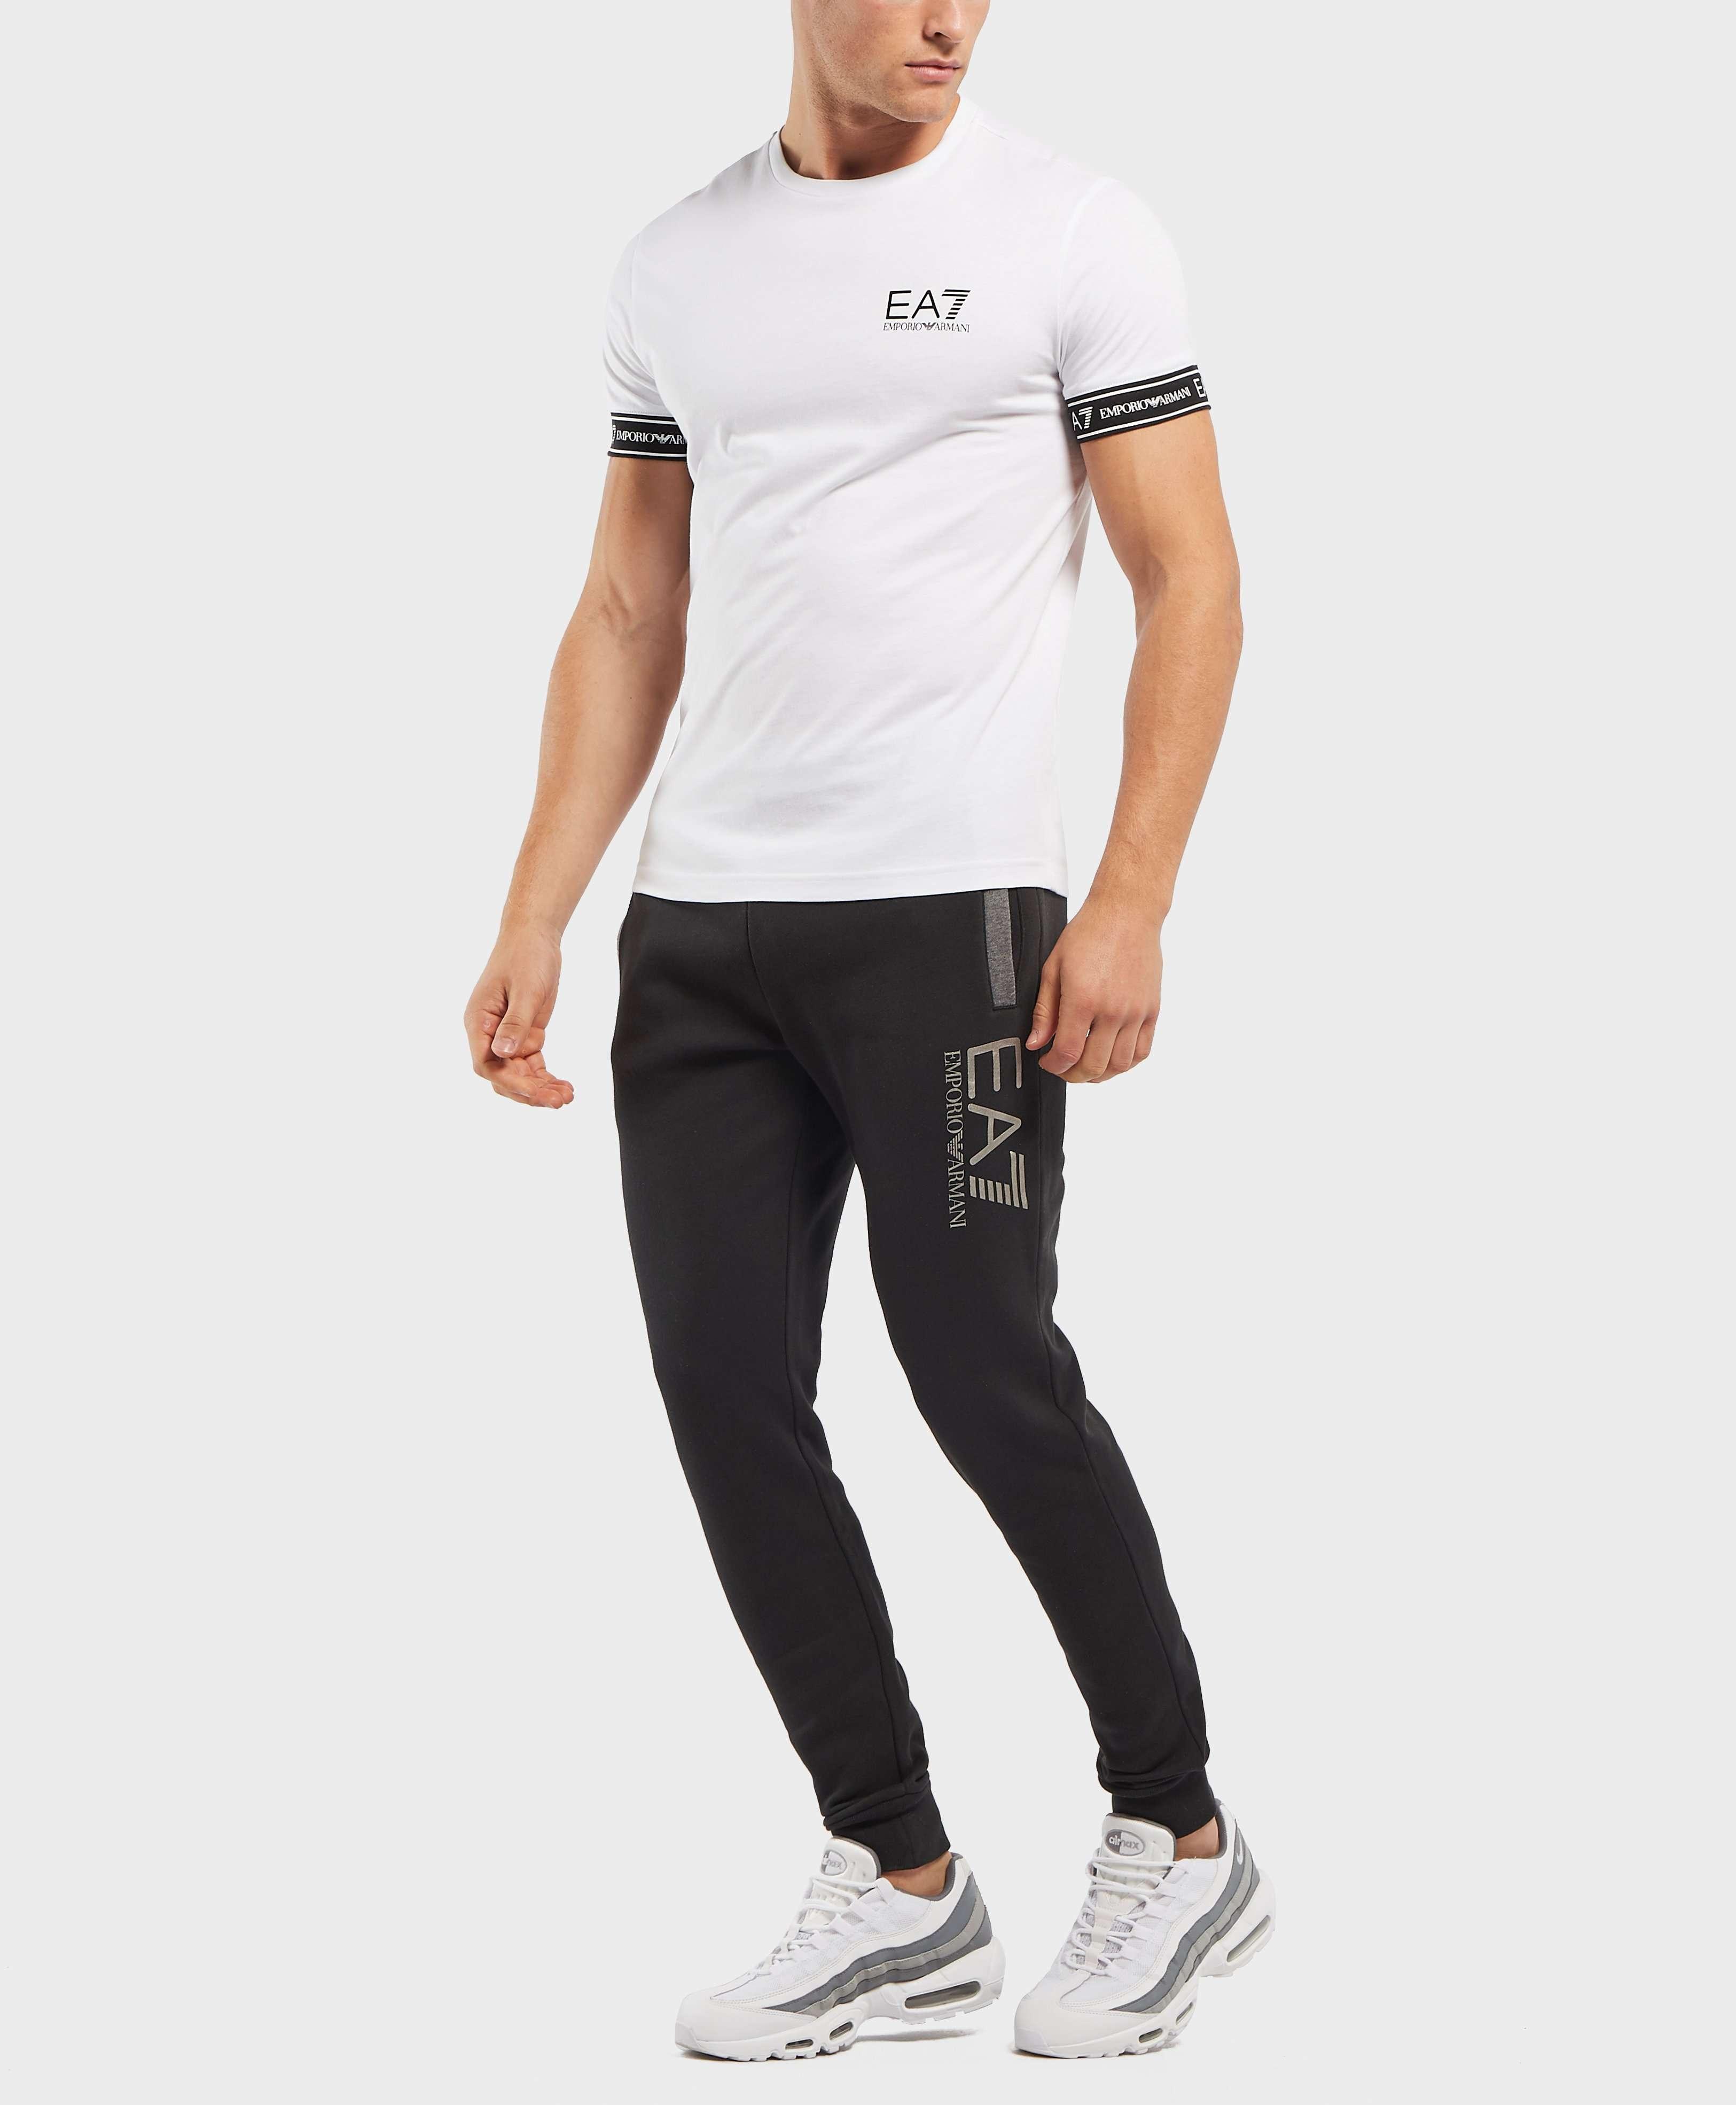 Emporio Armani EA7 Tritonal Cuffed Fleece Pants